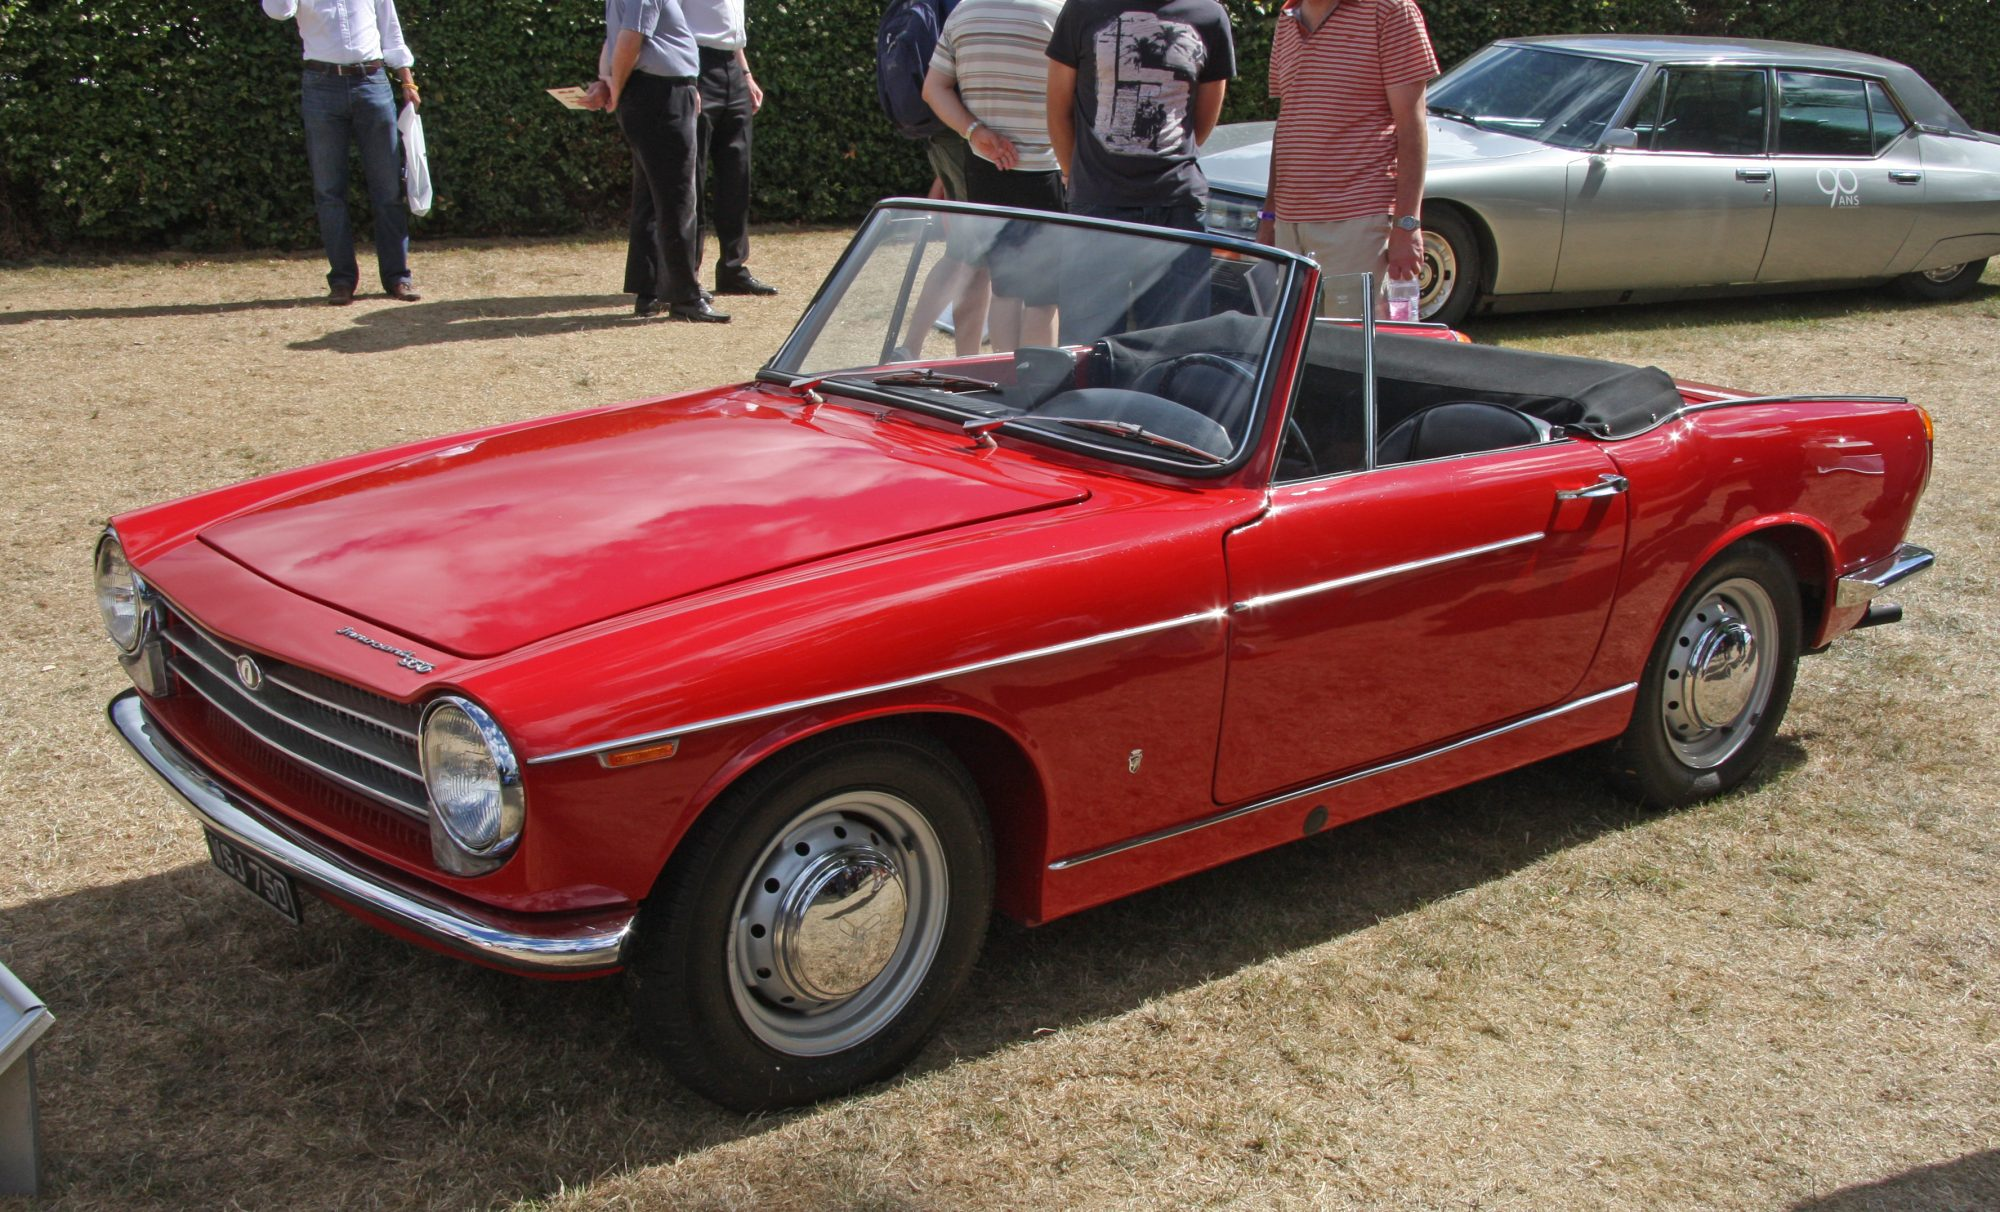 carandclassic, carandclassic.co.uk, italy, italian car, fiat, lancis, lamborghini, ferrari, integrale, alfa romeo, classic car, retro car, motoring, automotive